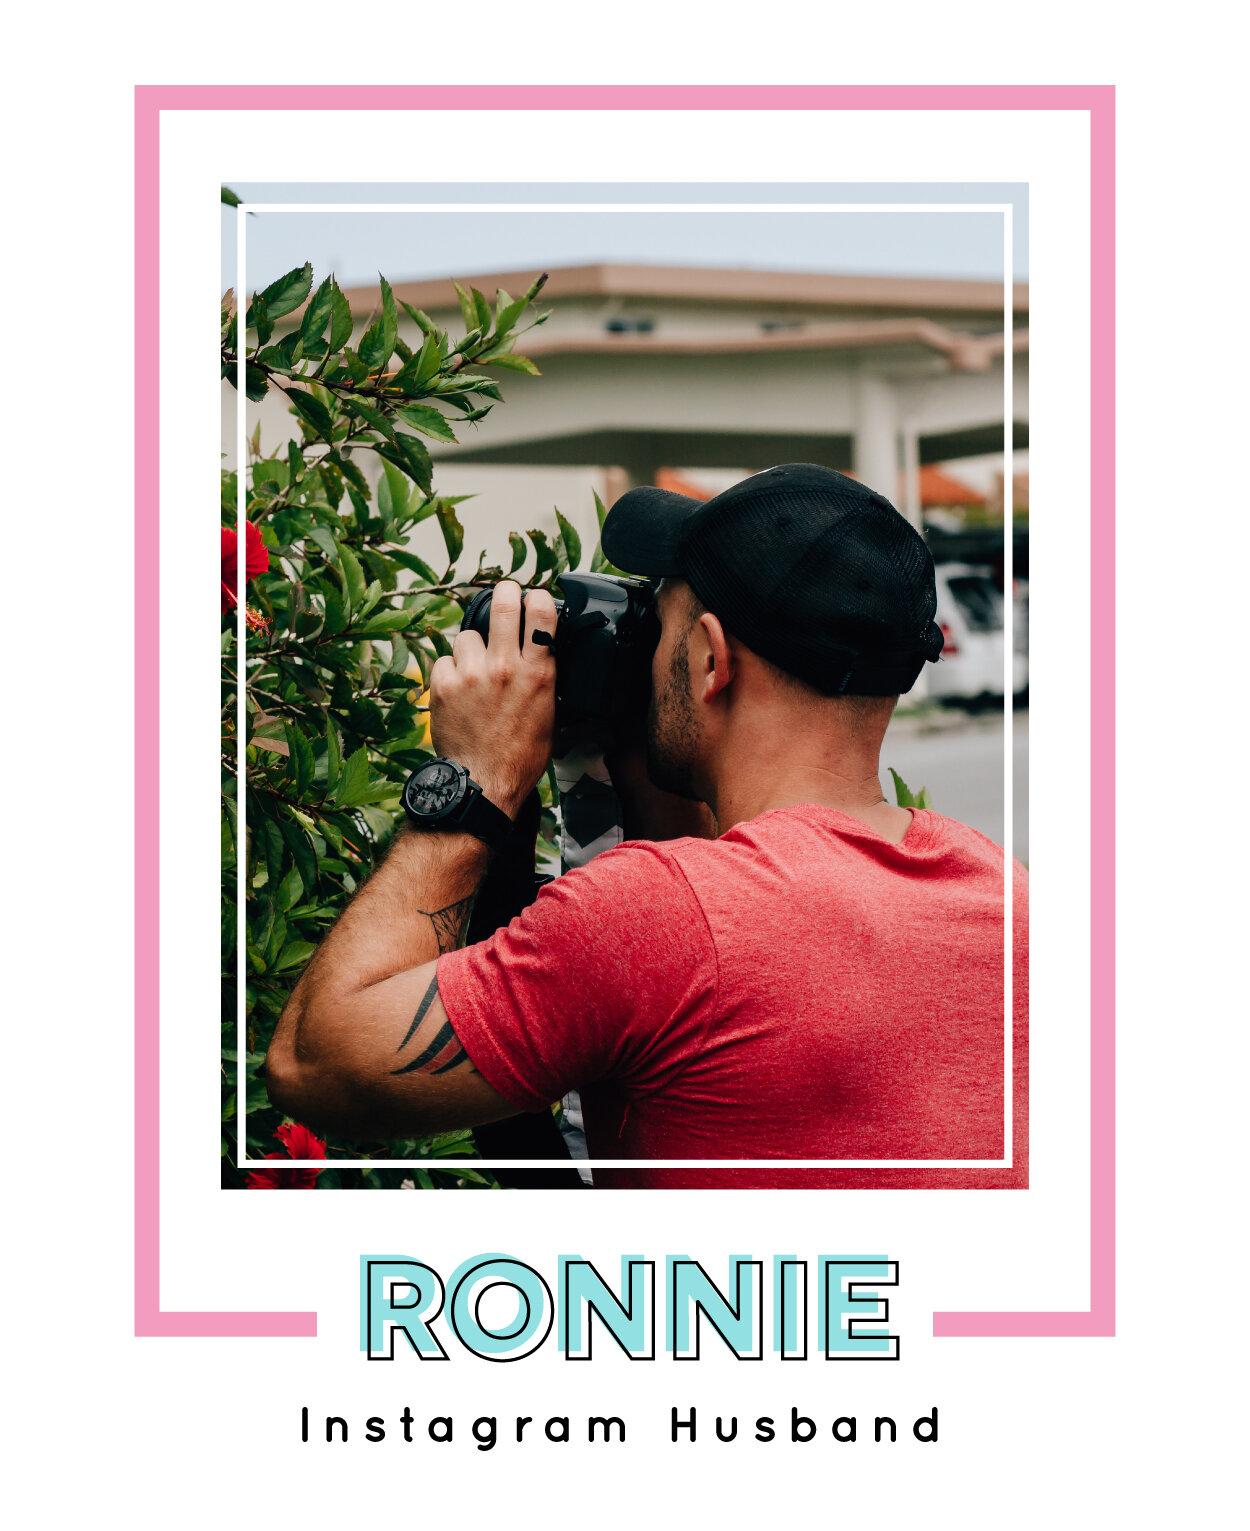 About Ronnie - shopmkkm.com